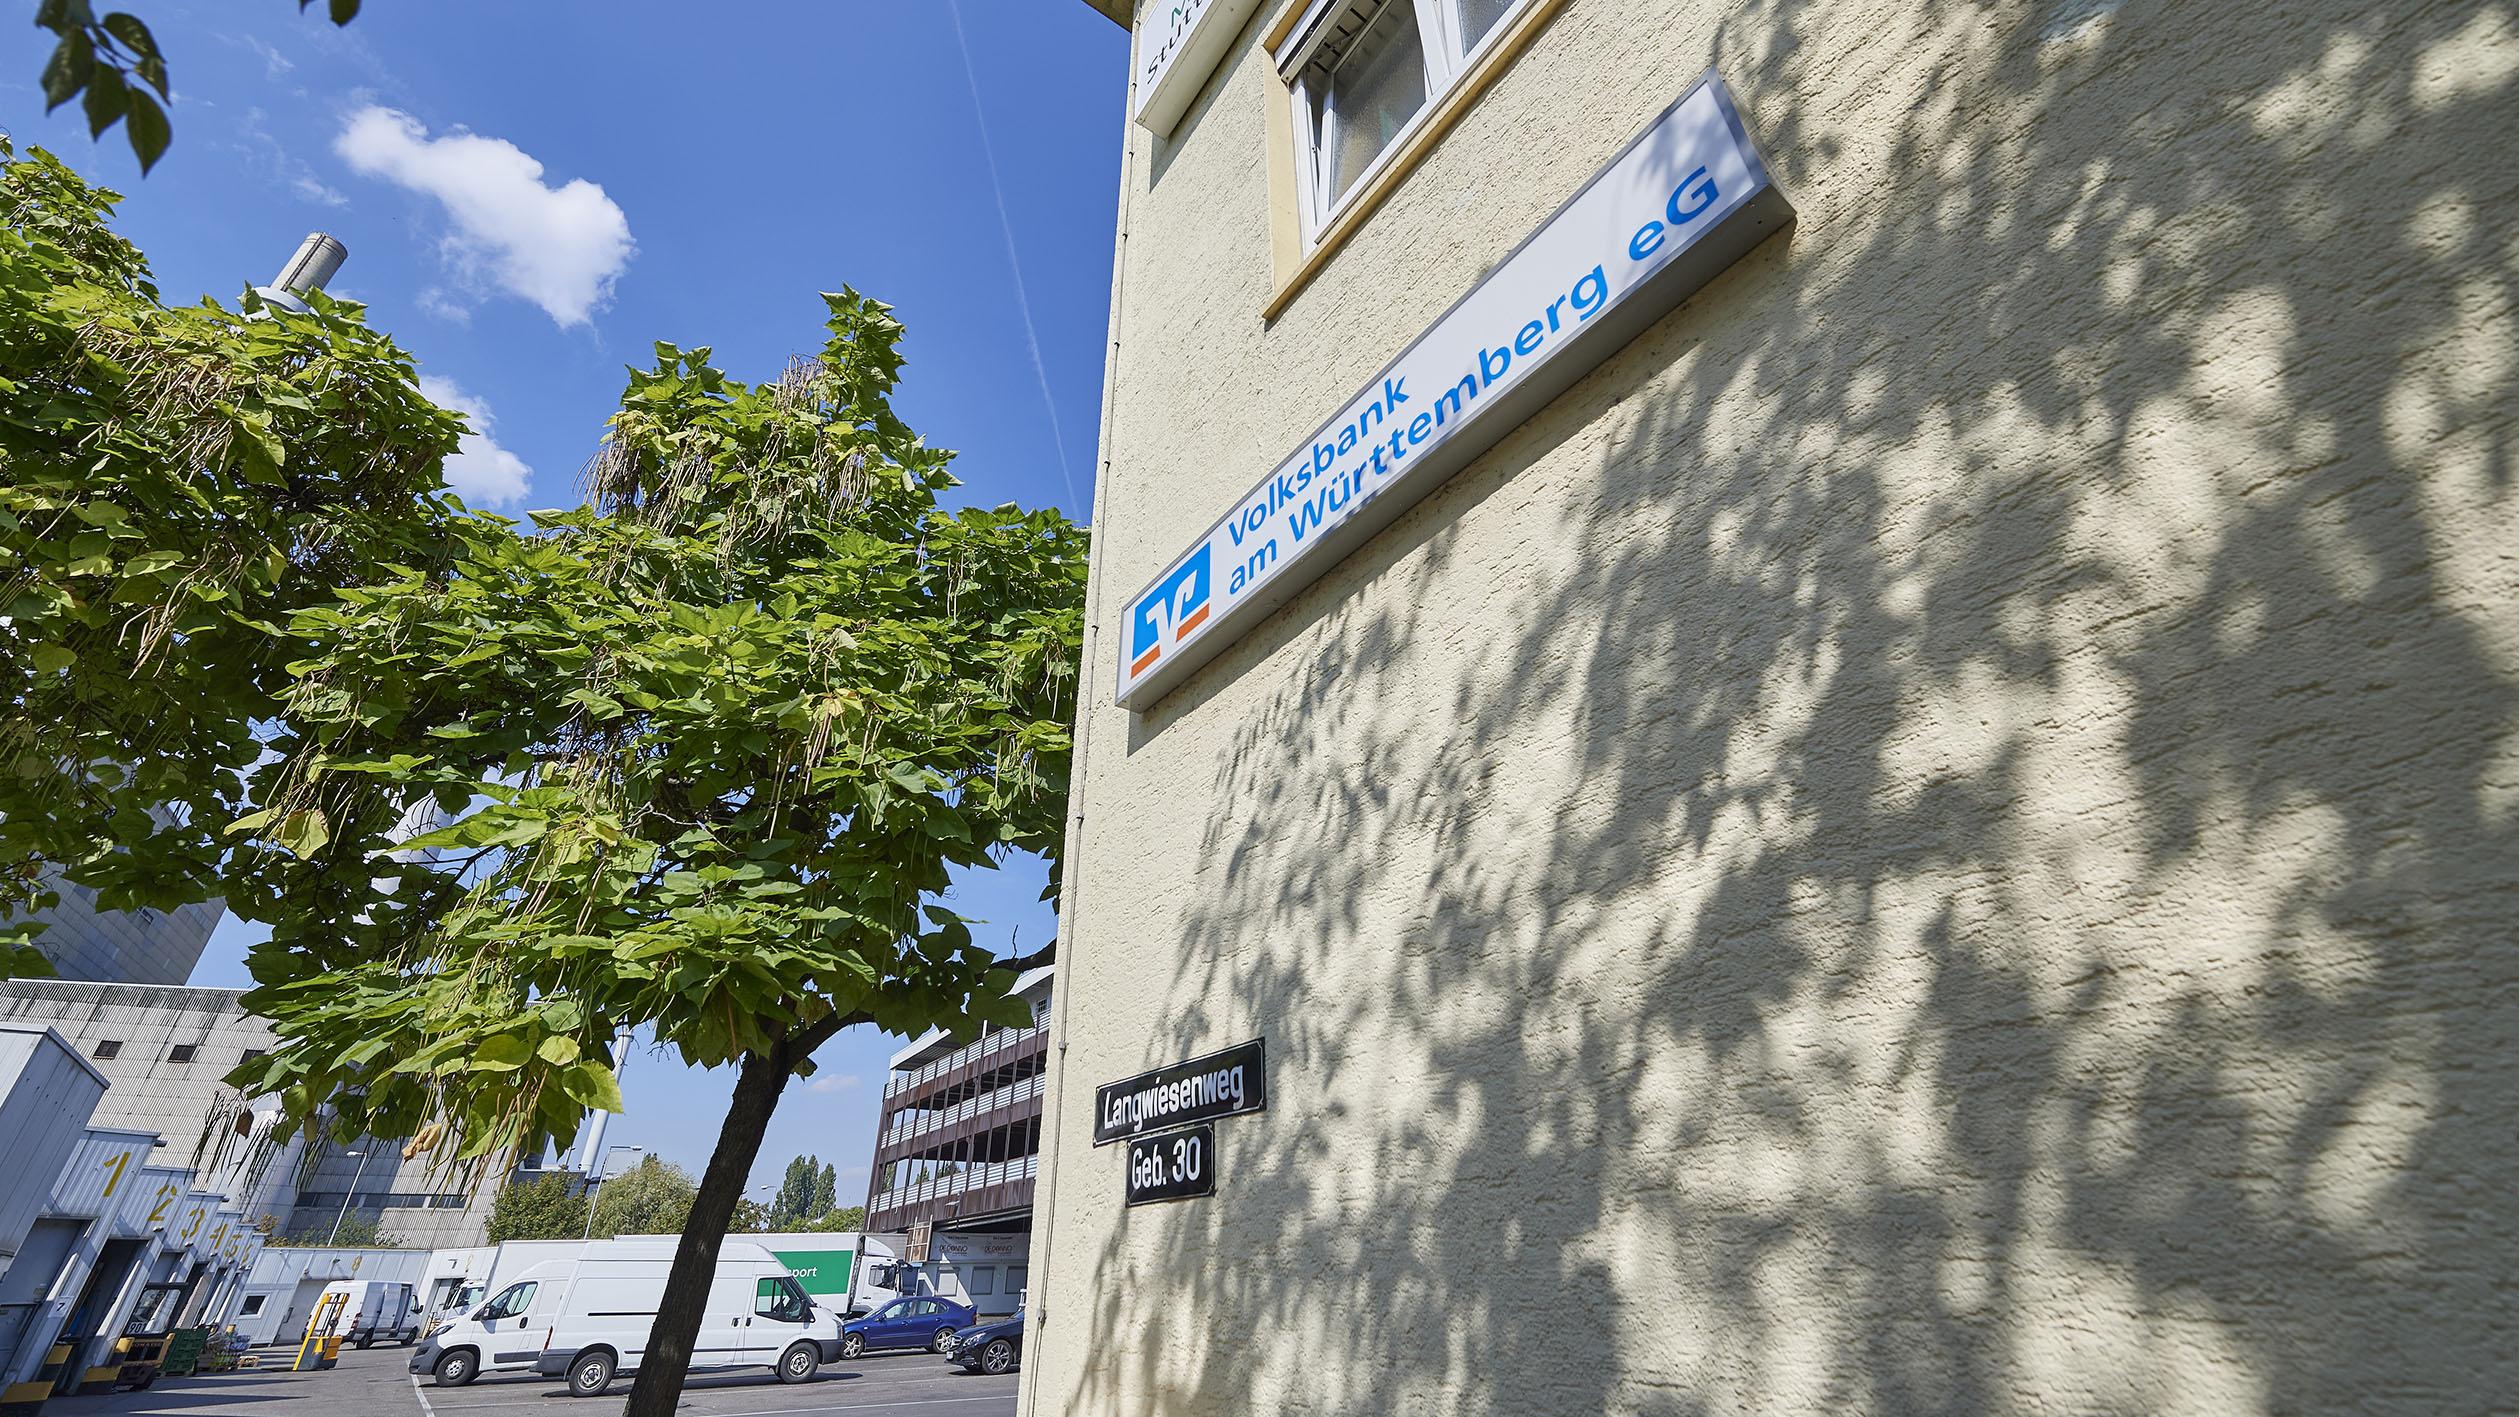 Volksbank am Württemberg eG, Filiale Grossmarkt